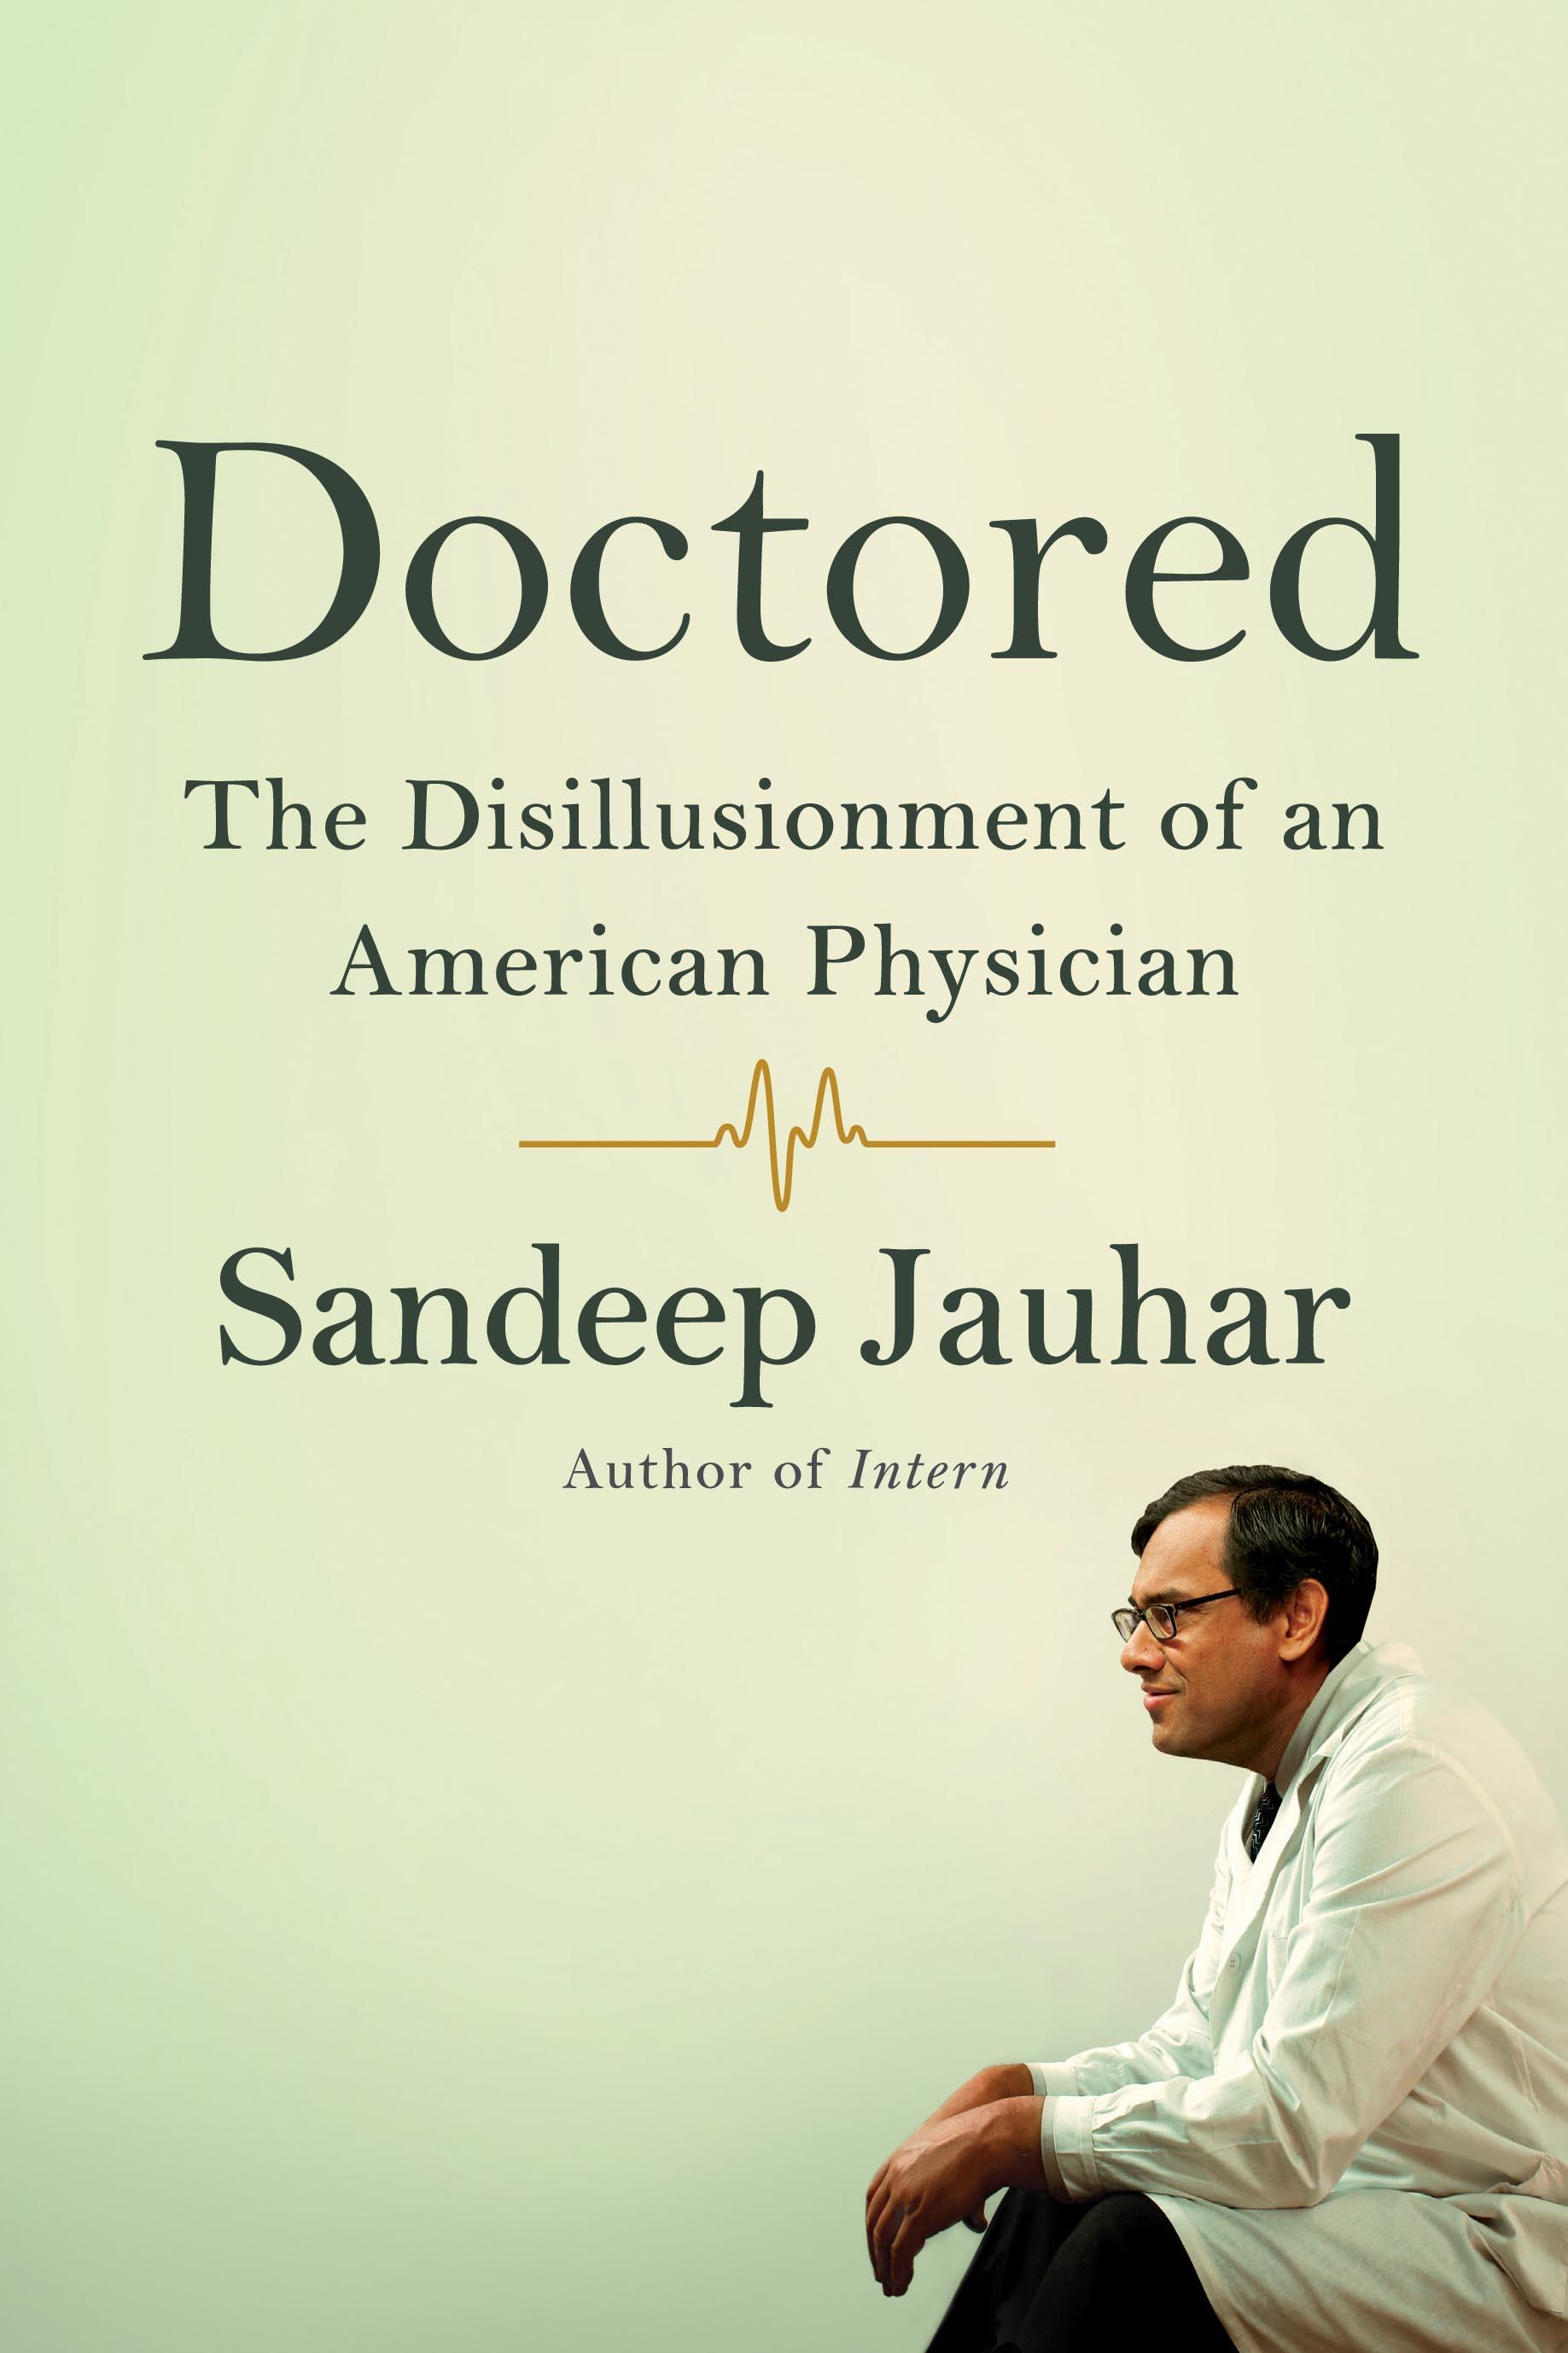 Doctored, by Sandeep Jauhar